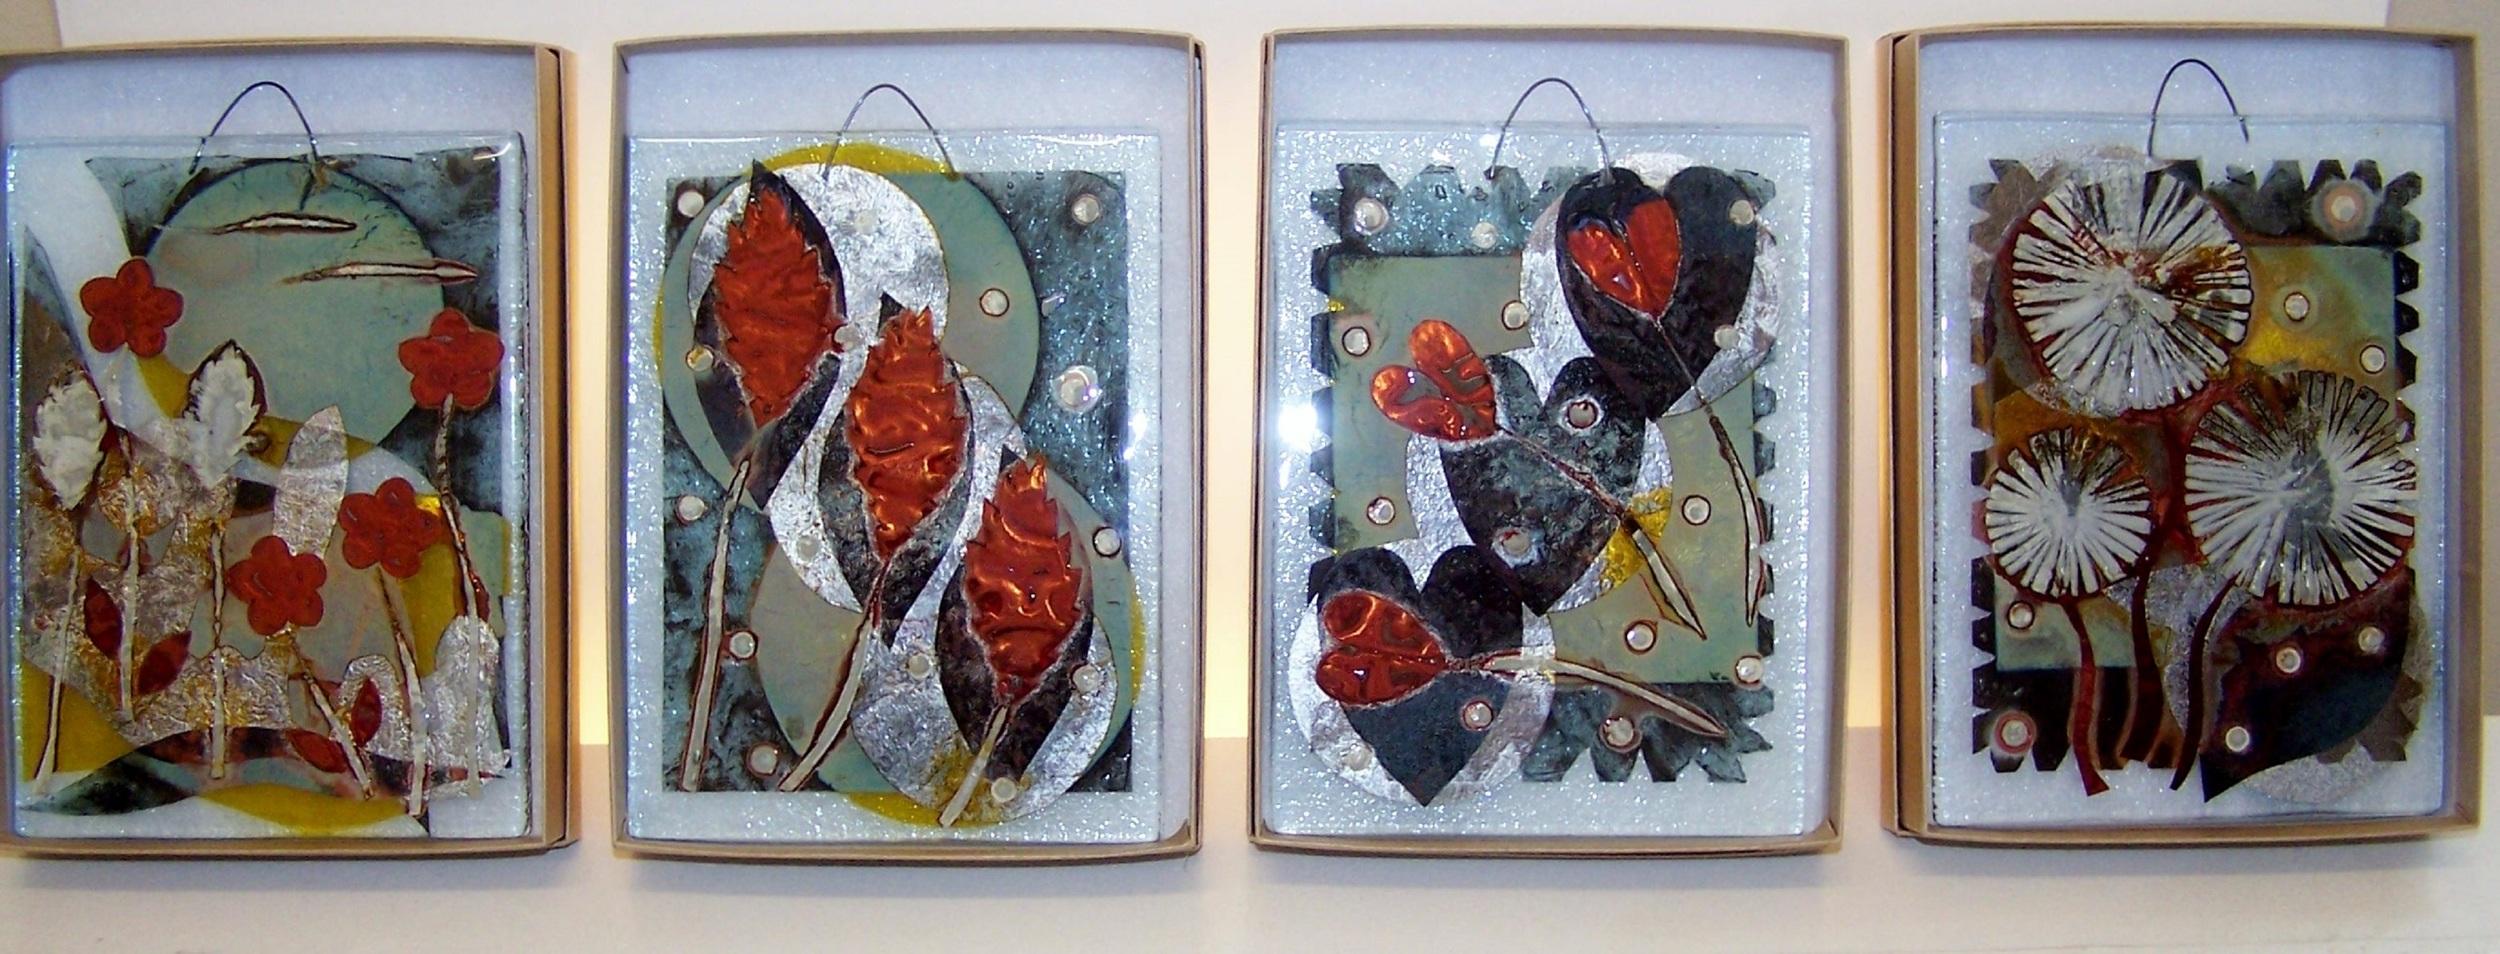 Hanging Panels   glass